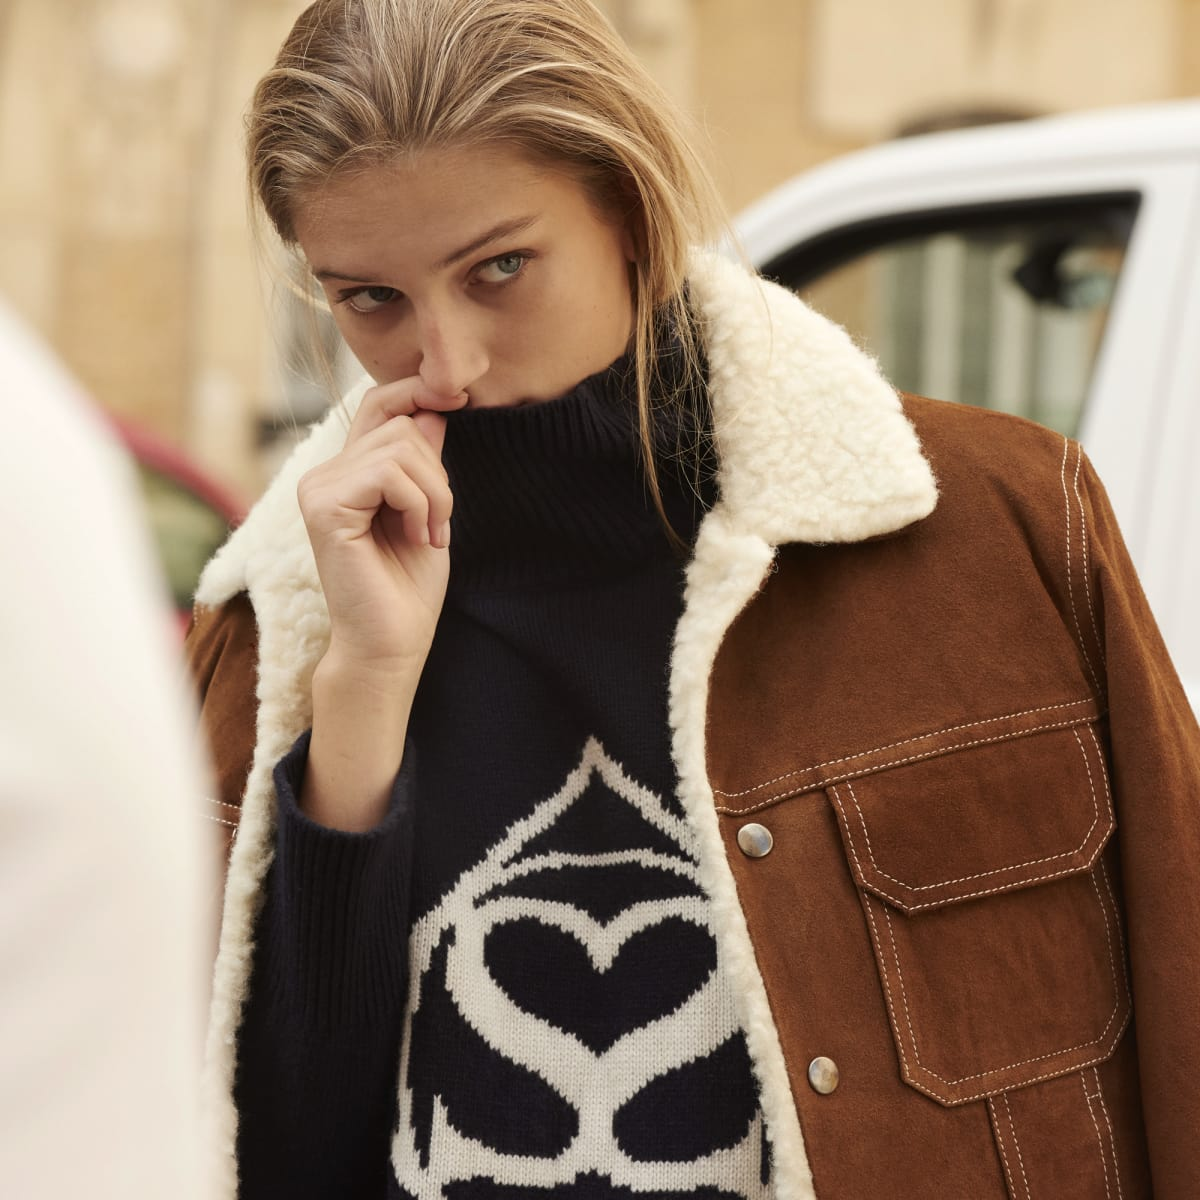 Sandro women's coat Paris